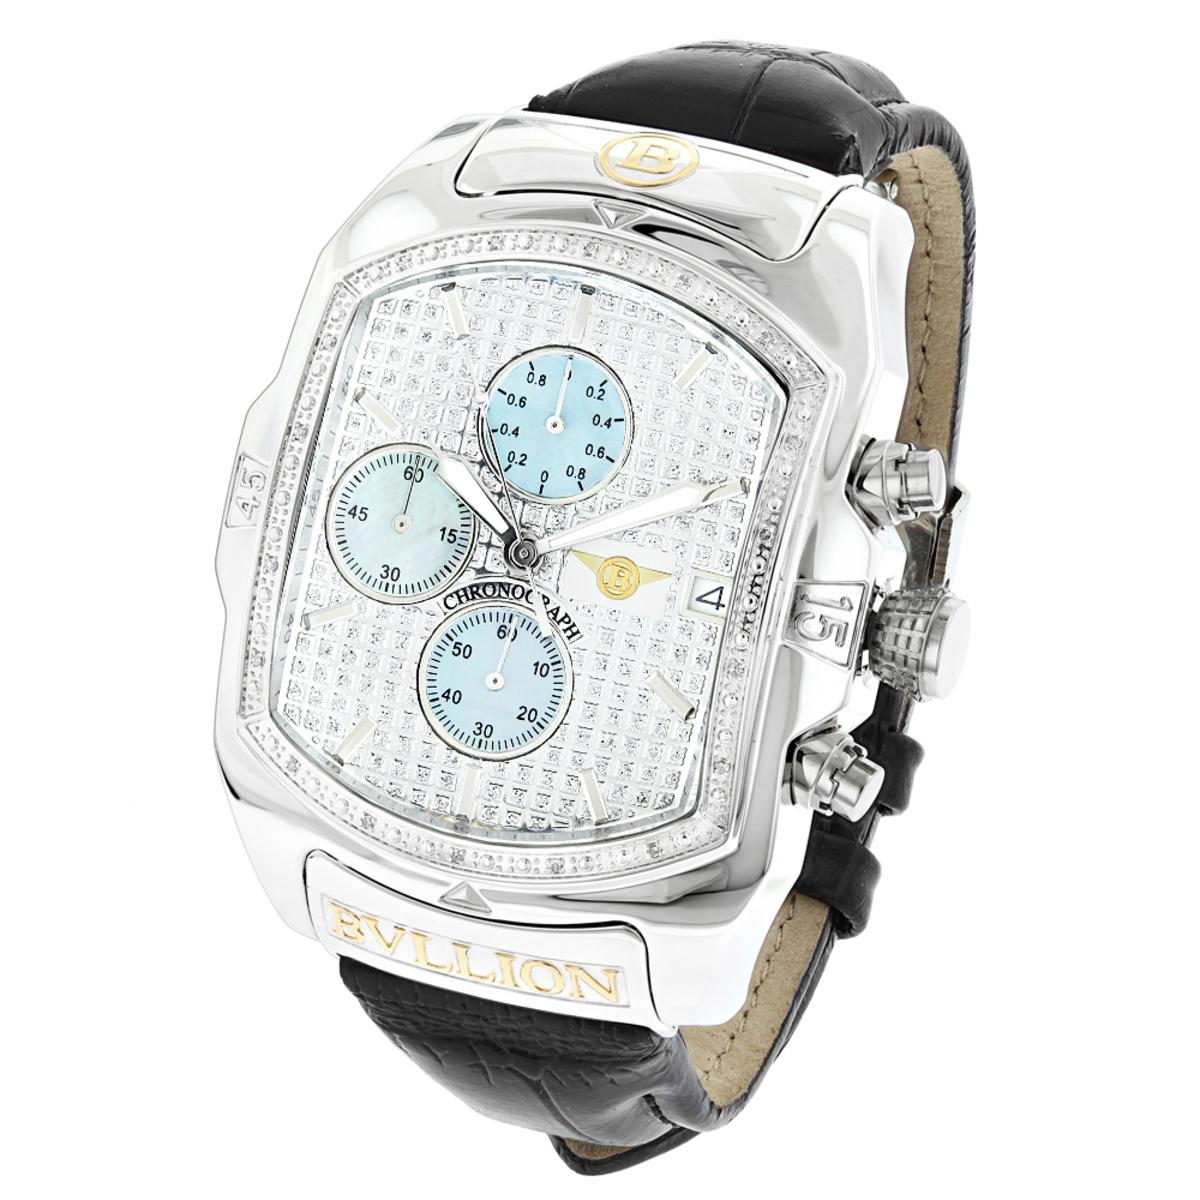 Large Bubble Watches: Luxurman Bullion Diamond Watch For Men w Chronograph